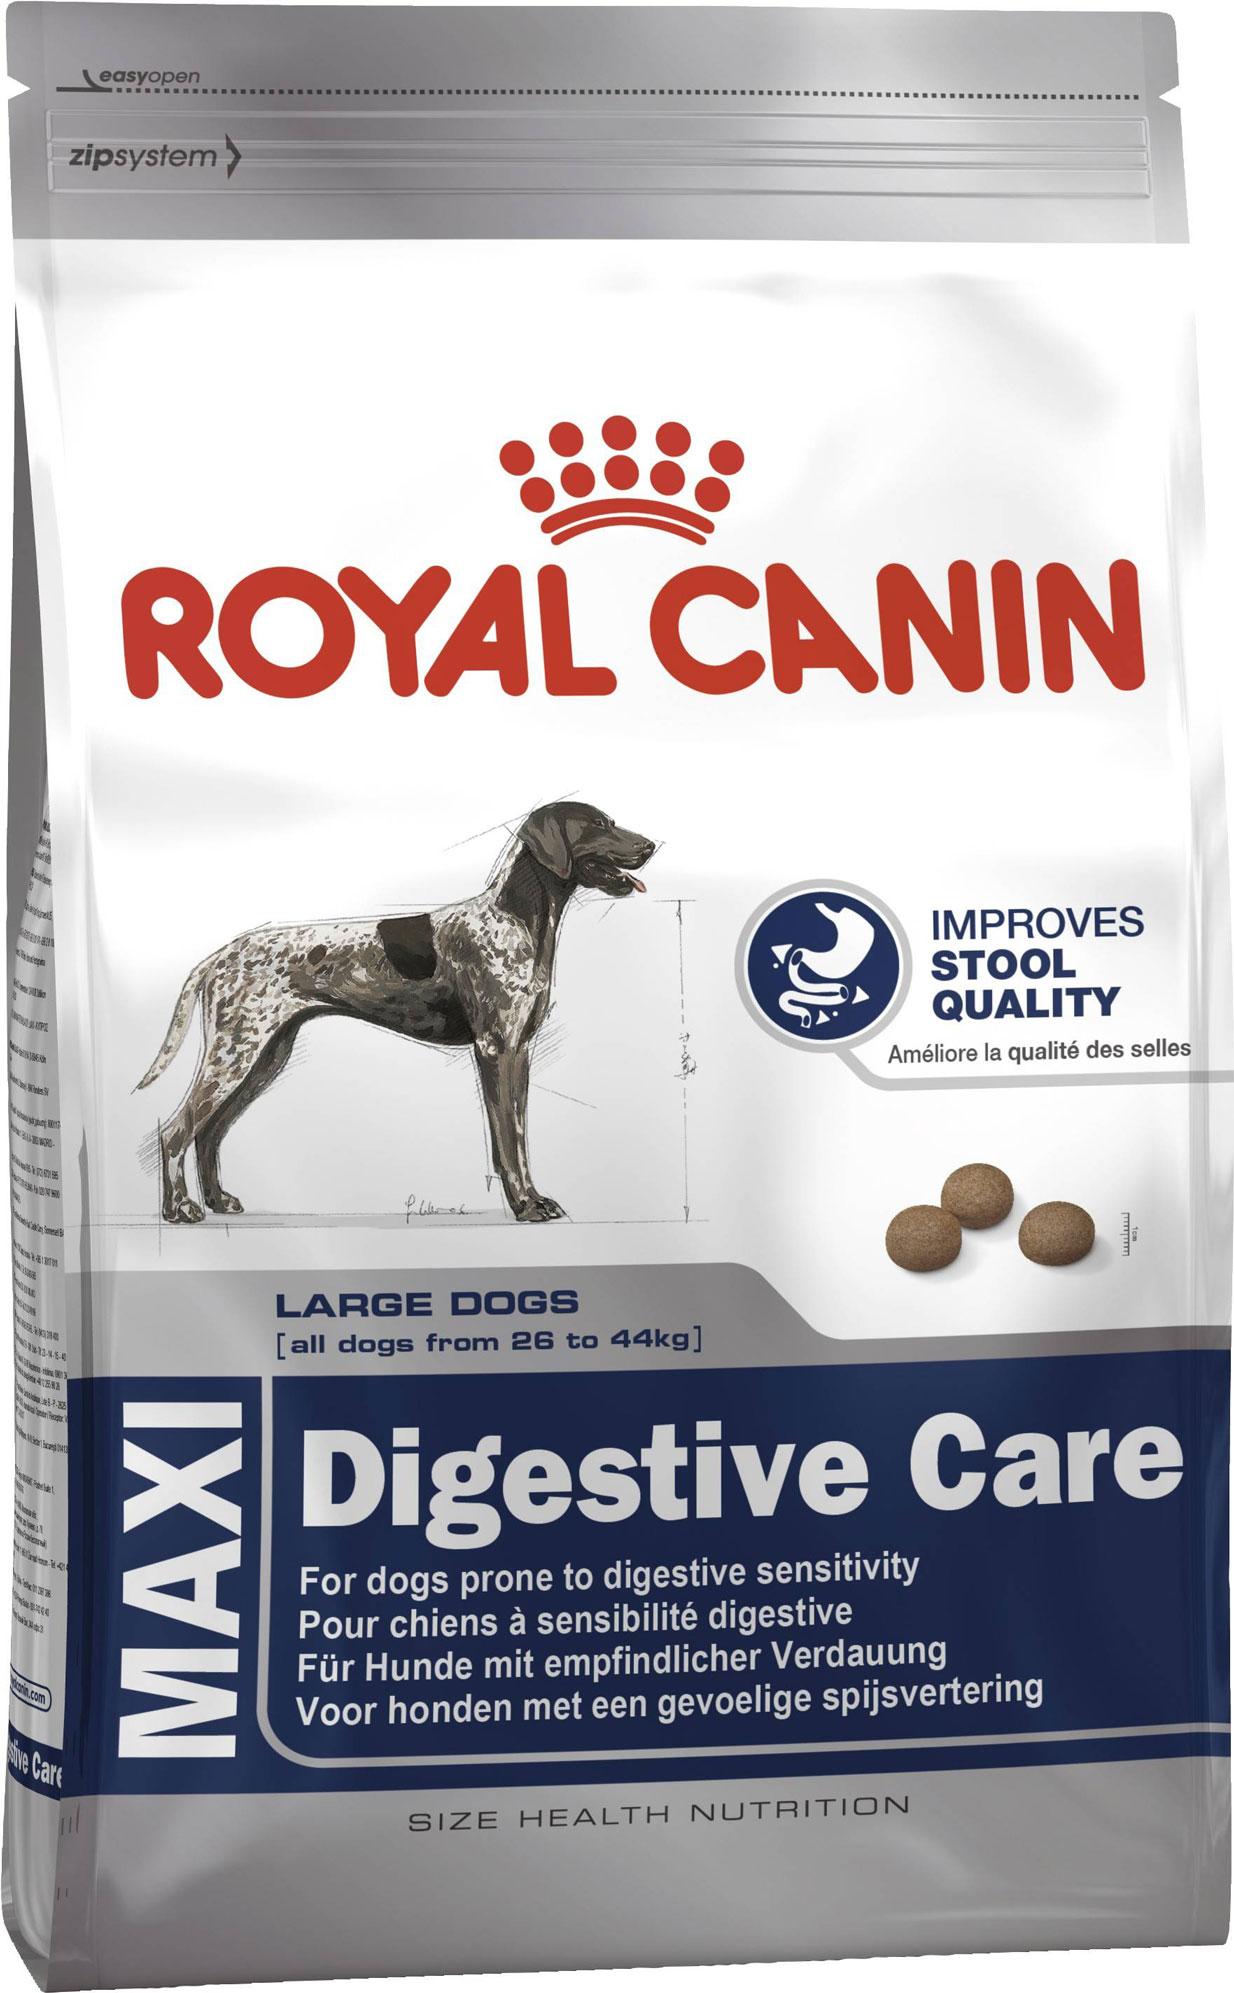 ROYAL CANIN MAXI DIGESTIVE CARE – сухий корм для собак великих собак з чутливим травленням